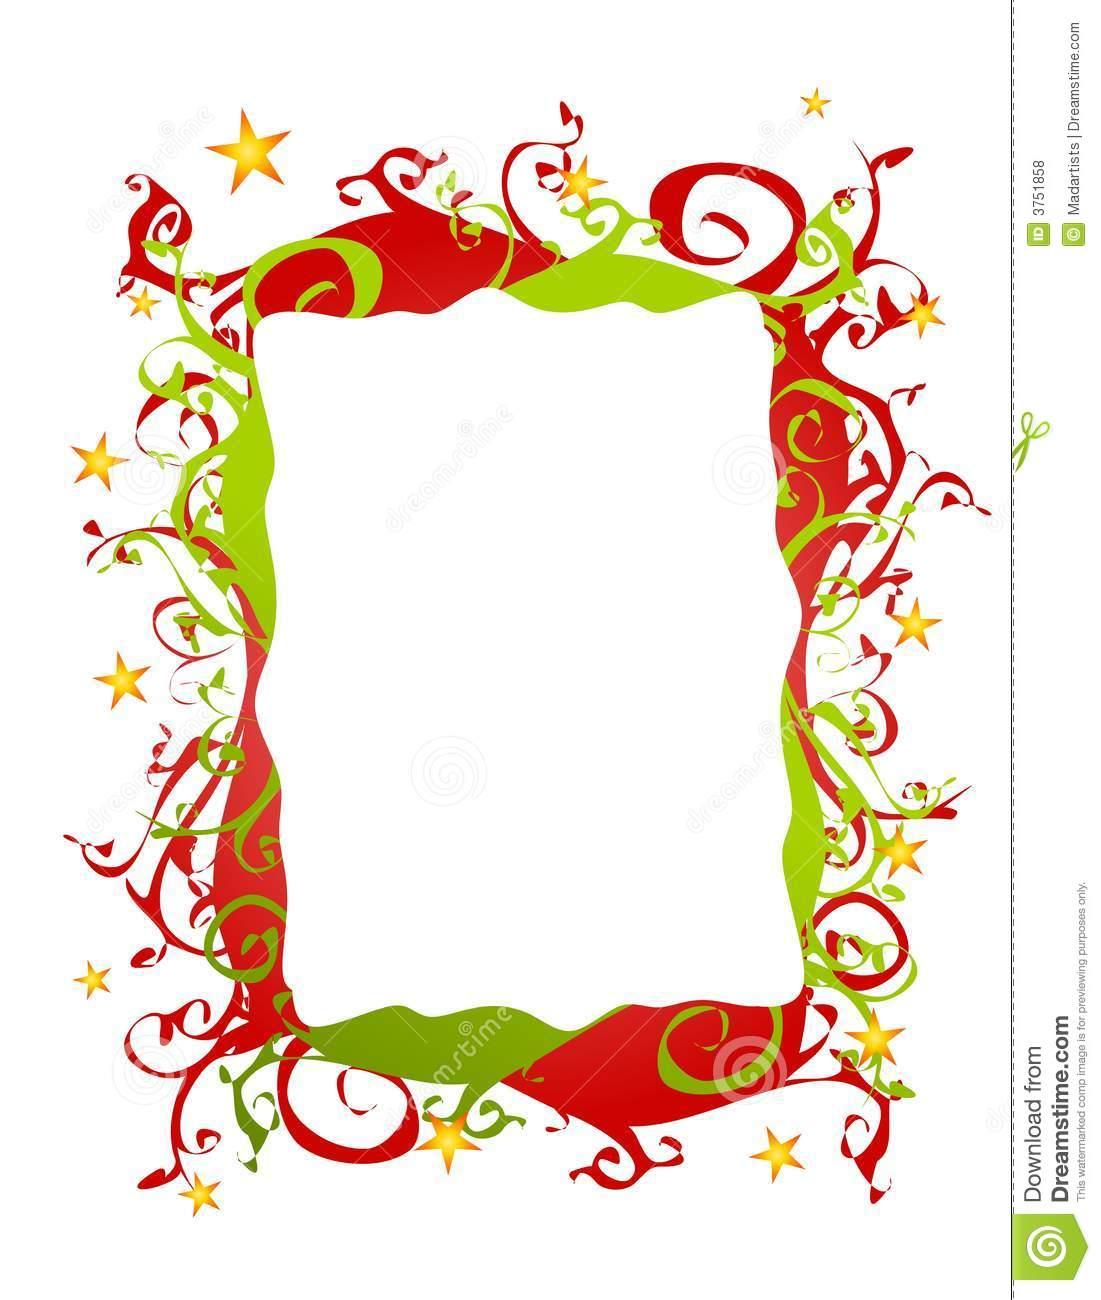 christmas borders clip art .-christmas borders clip art .-16